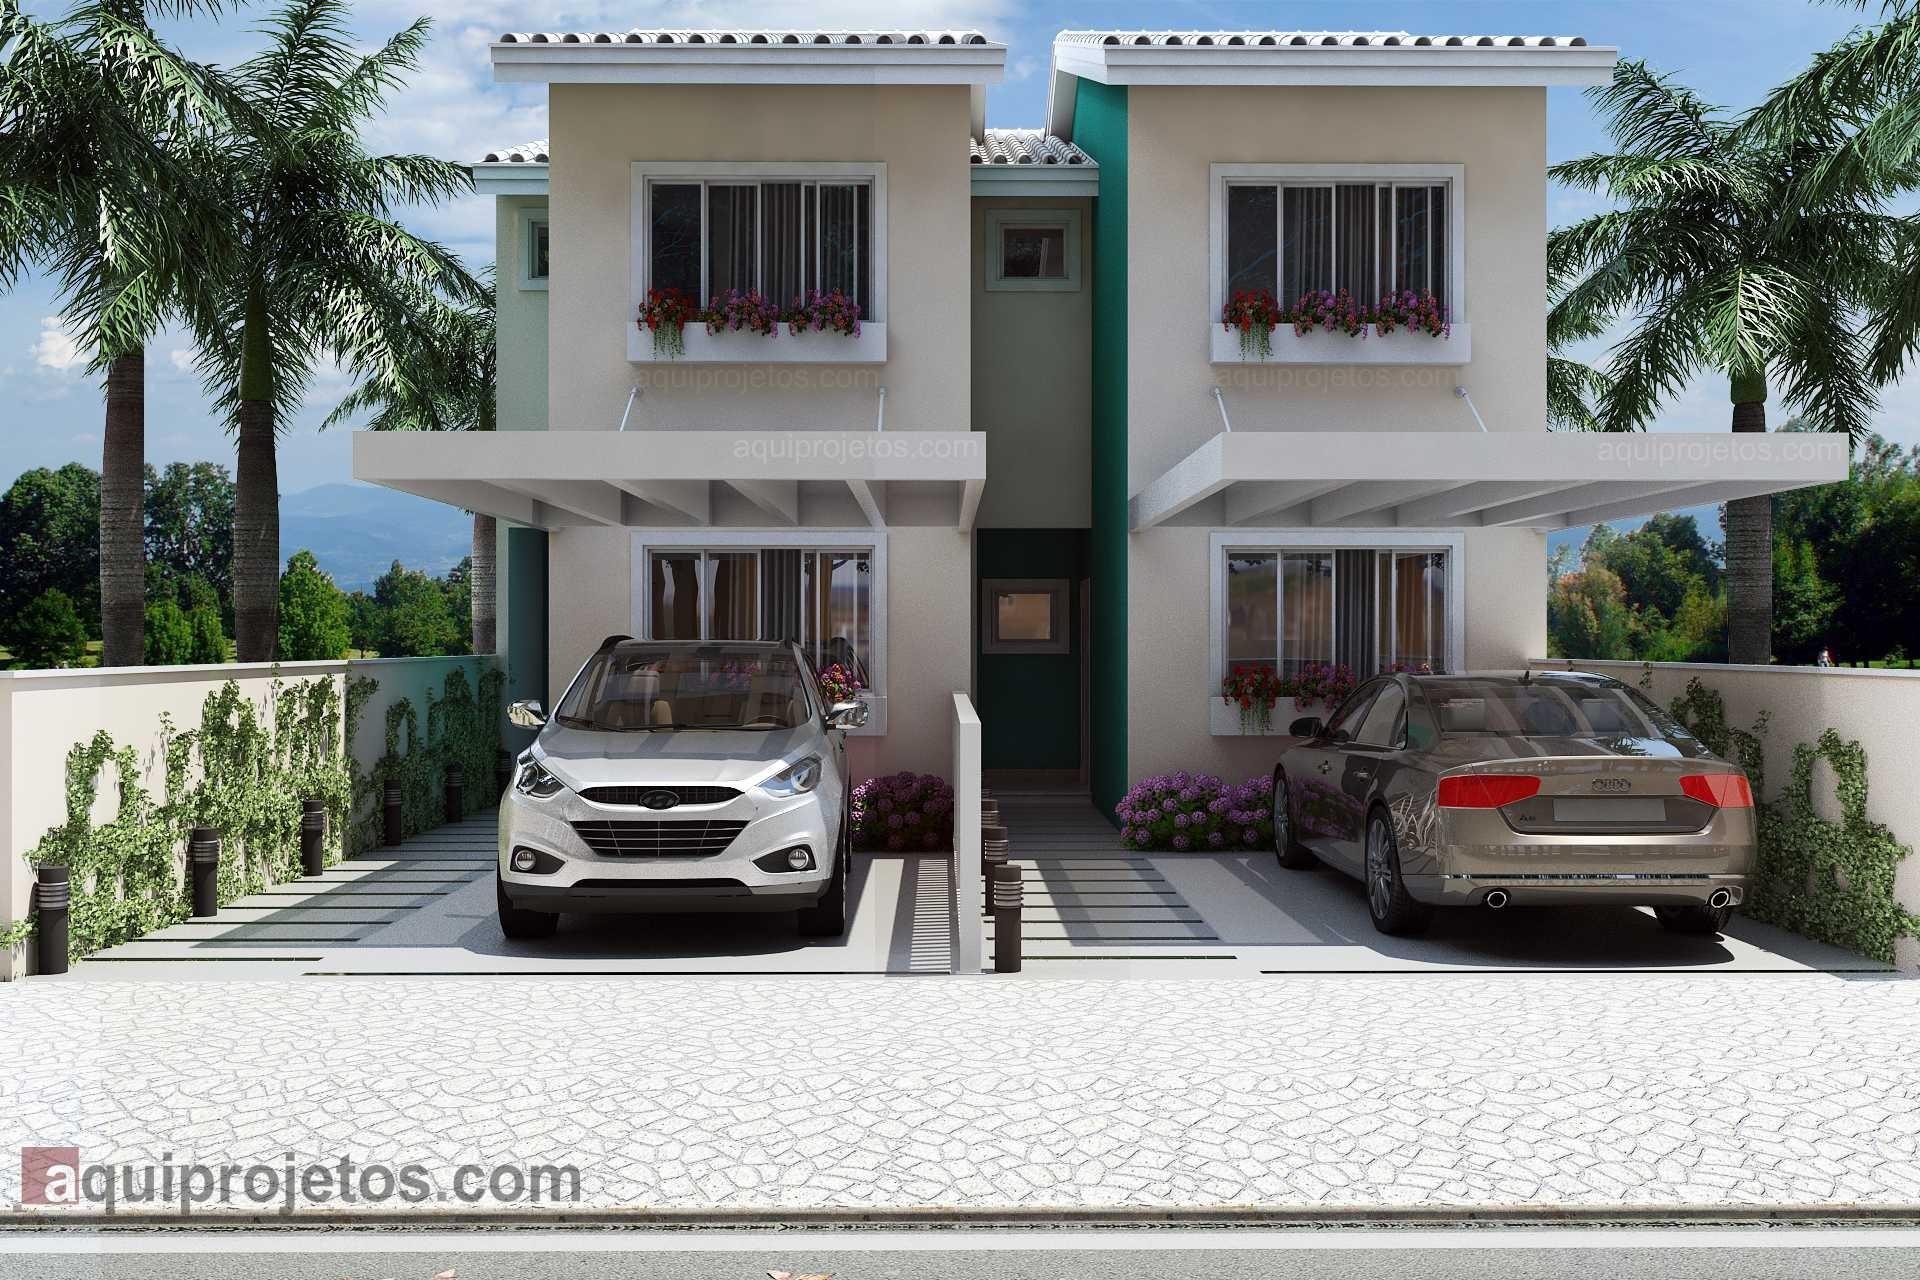 Fachada de casa - Plantas de casas